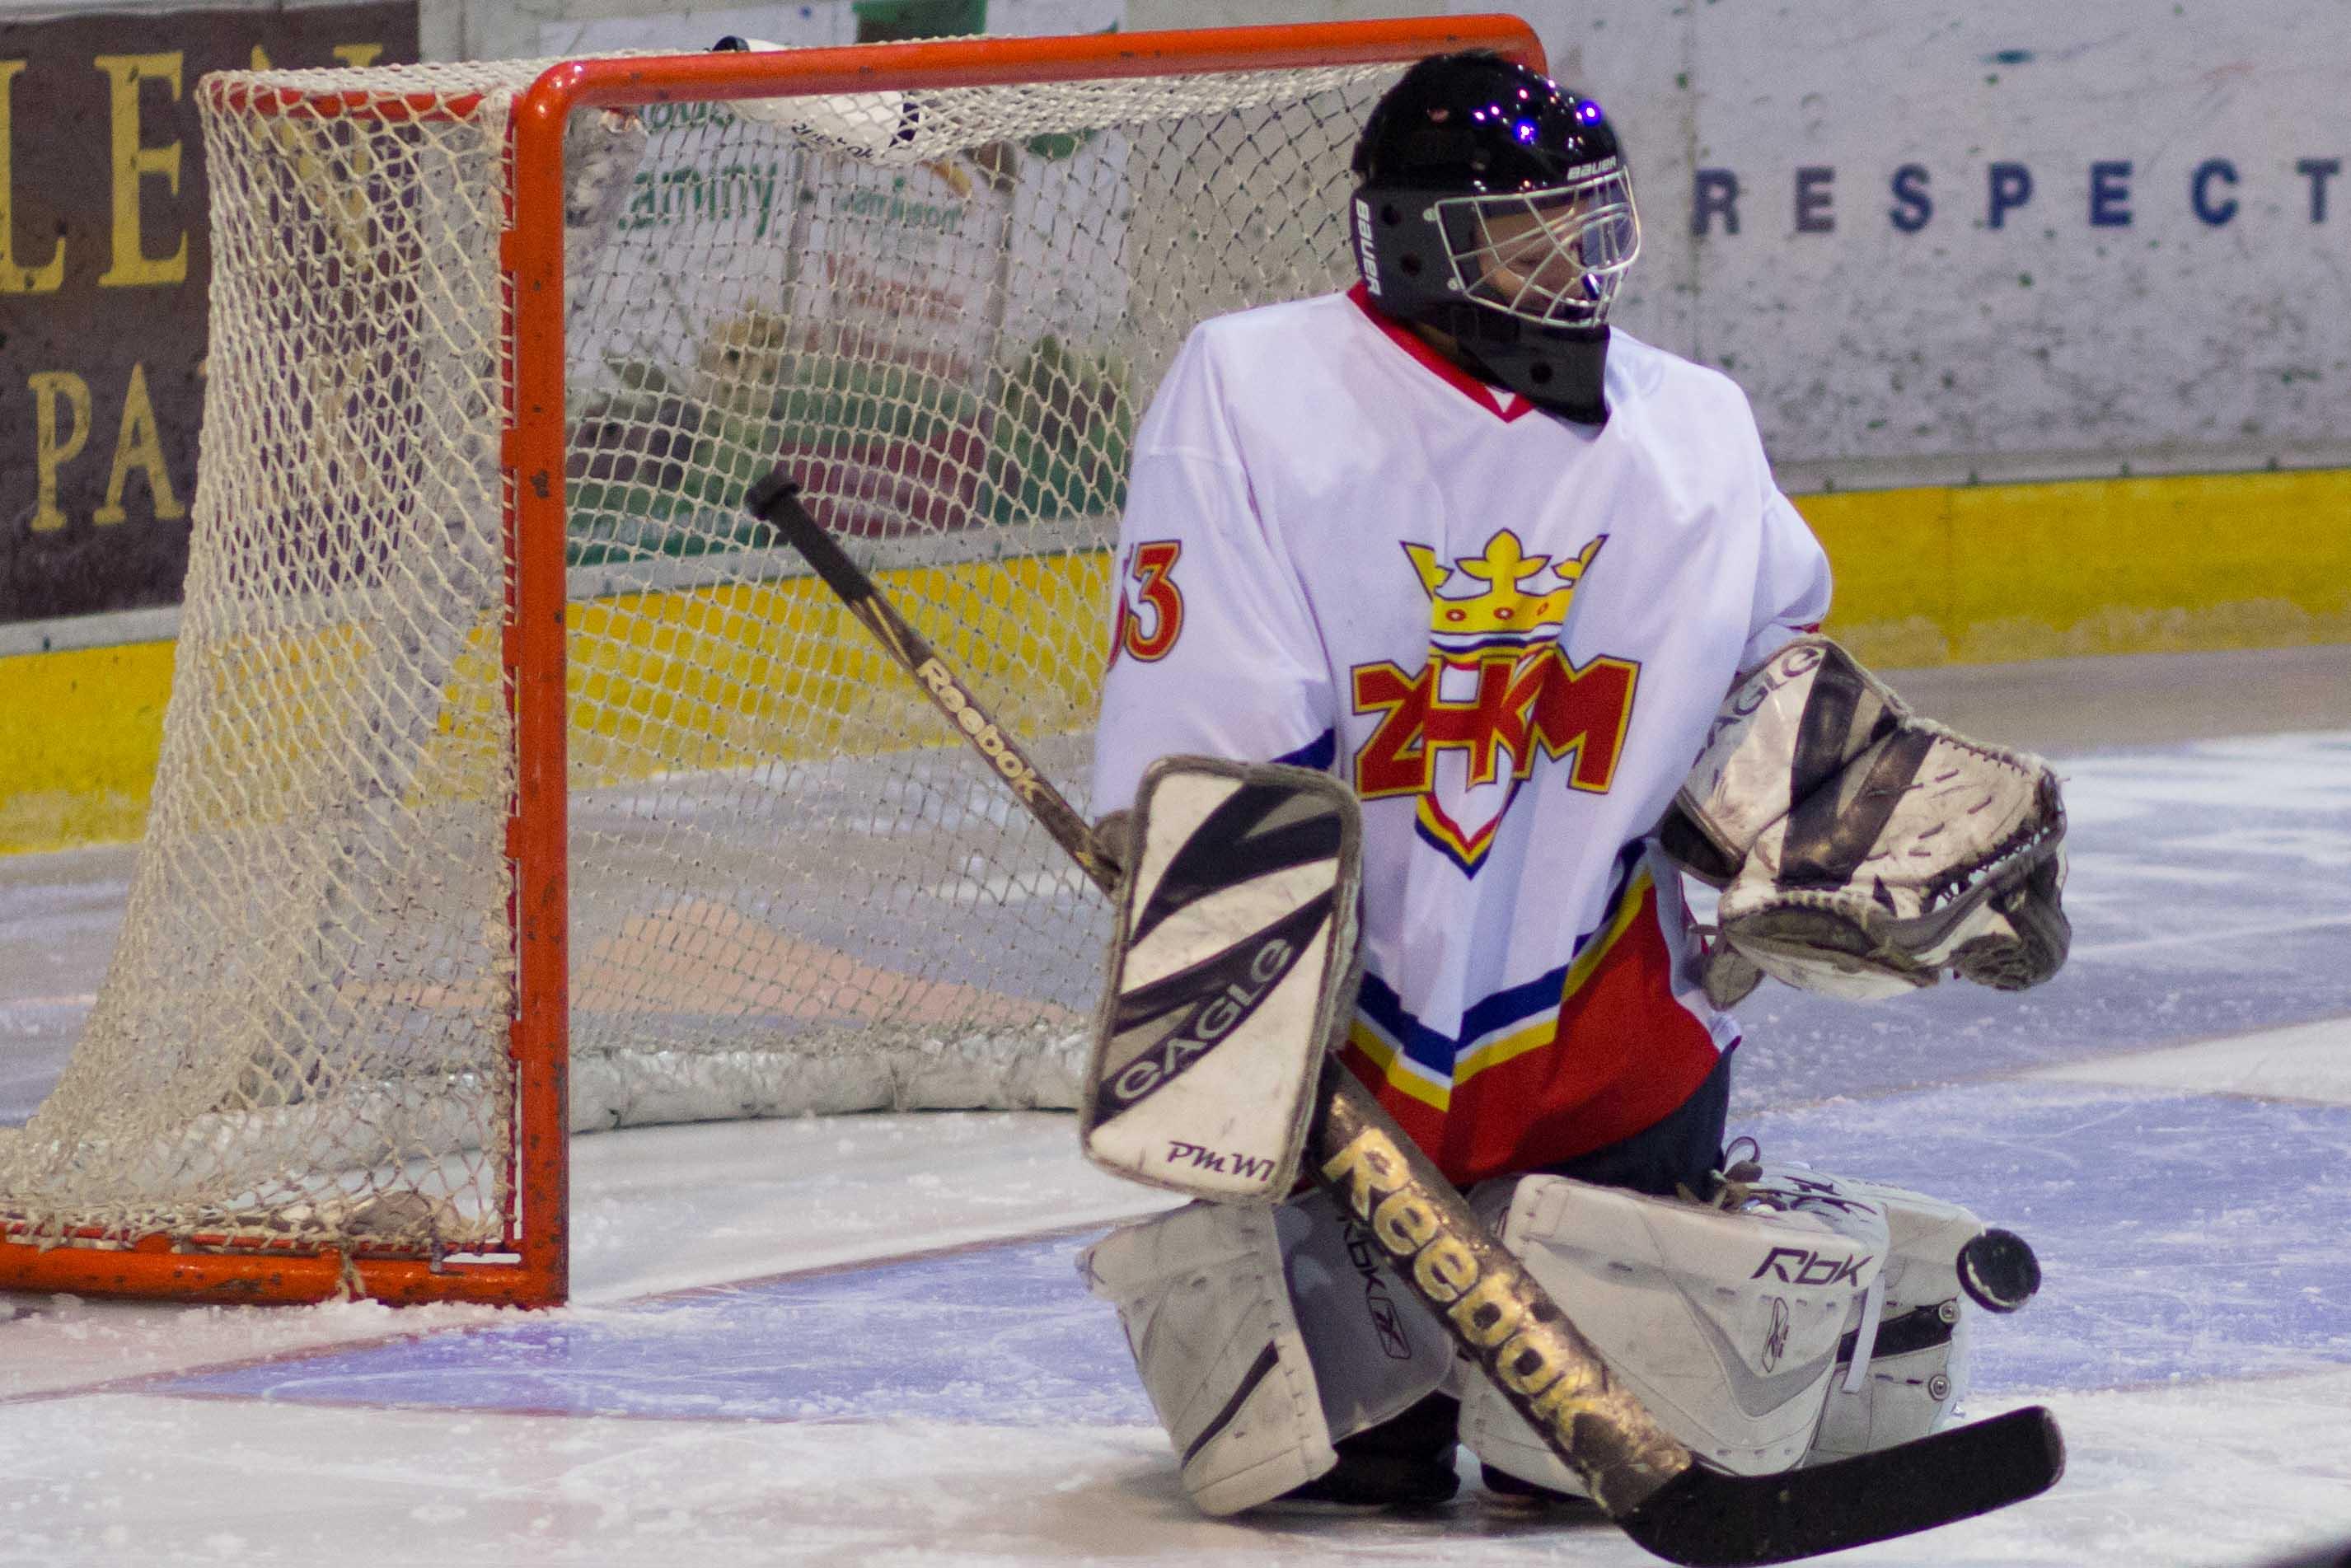 zhkm-zv-iskra-bb-2012-hokej-12